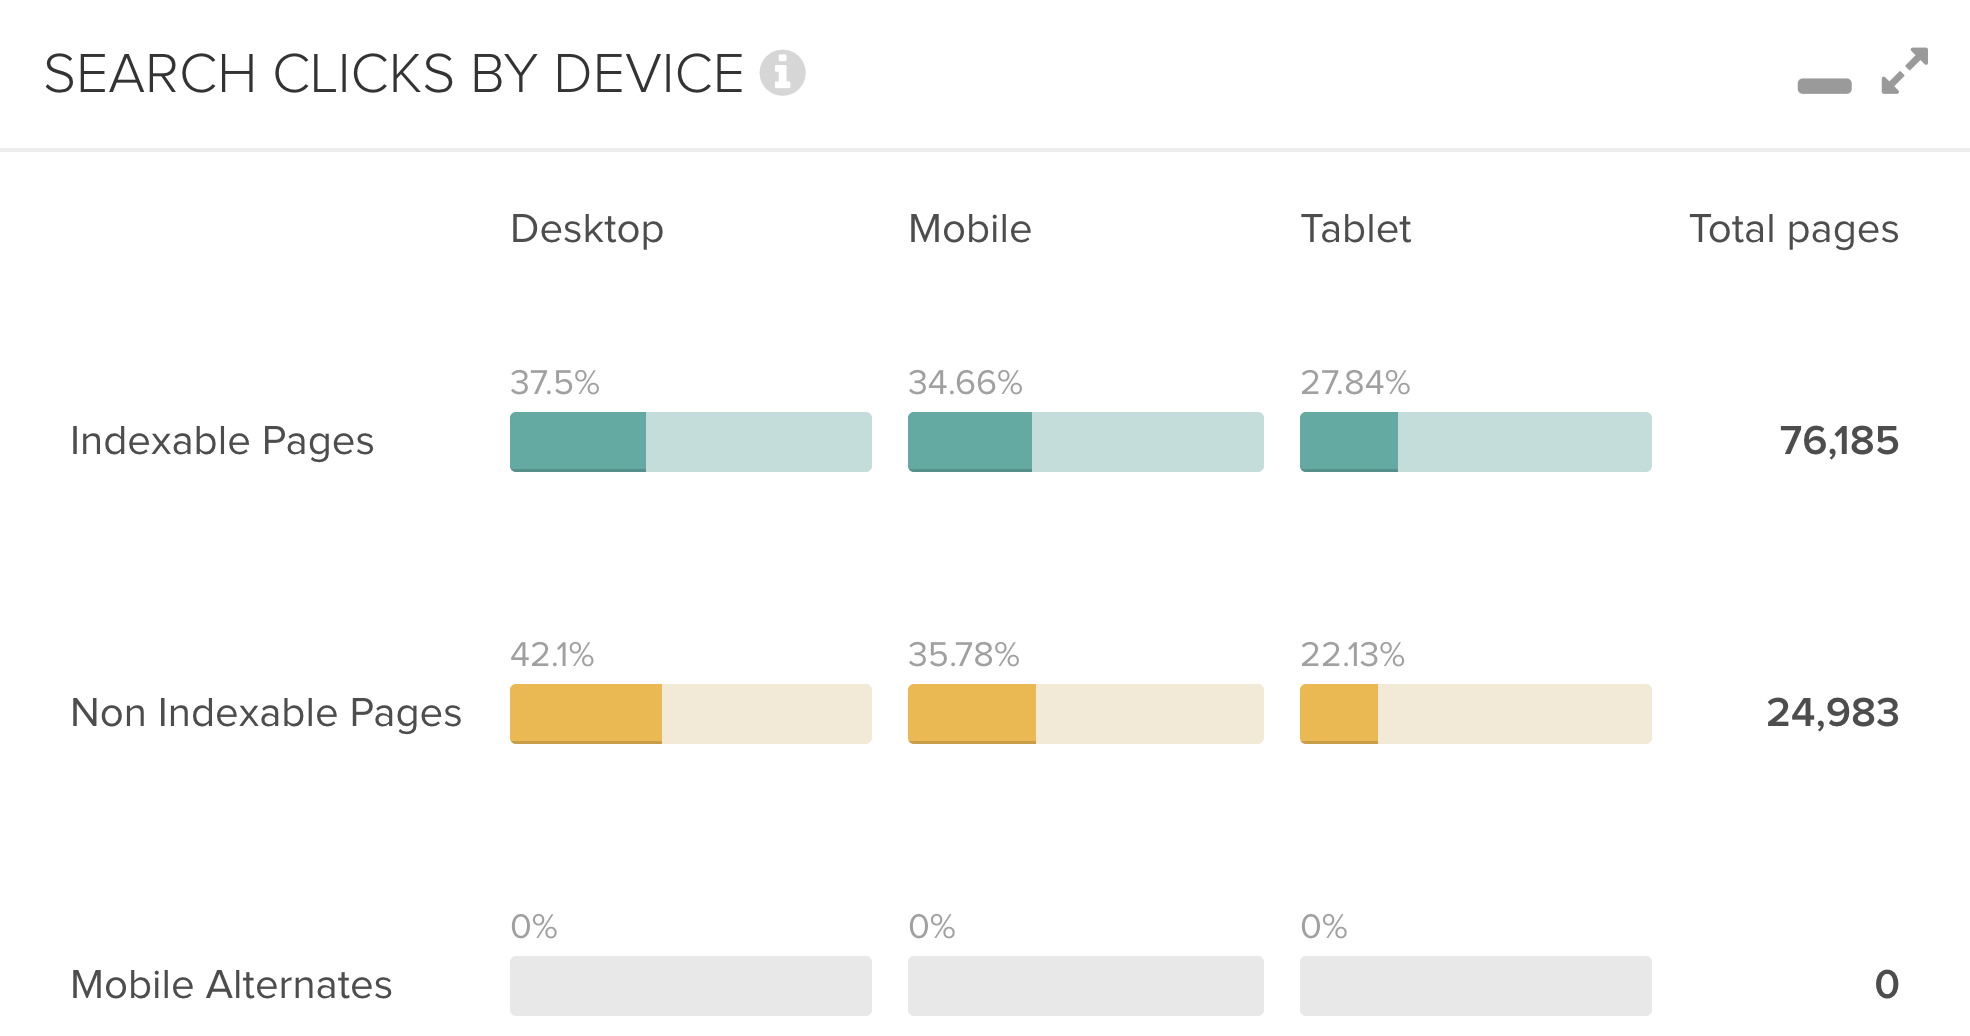 DeepCrawl Search Clicks by Device graph